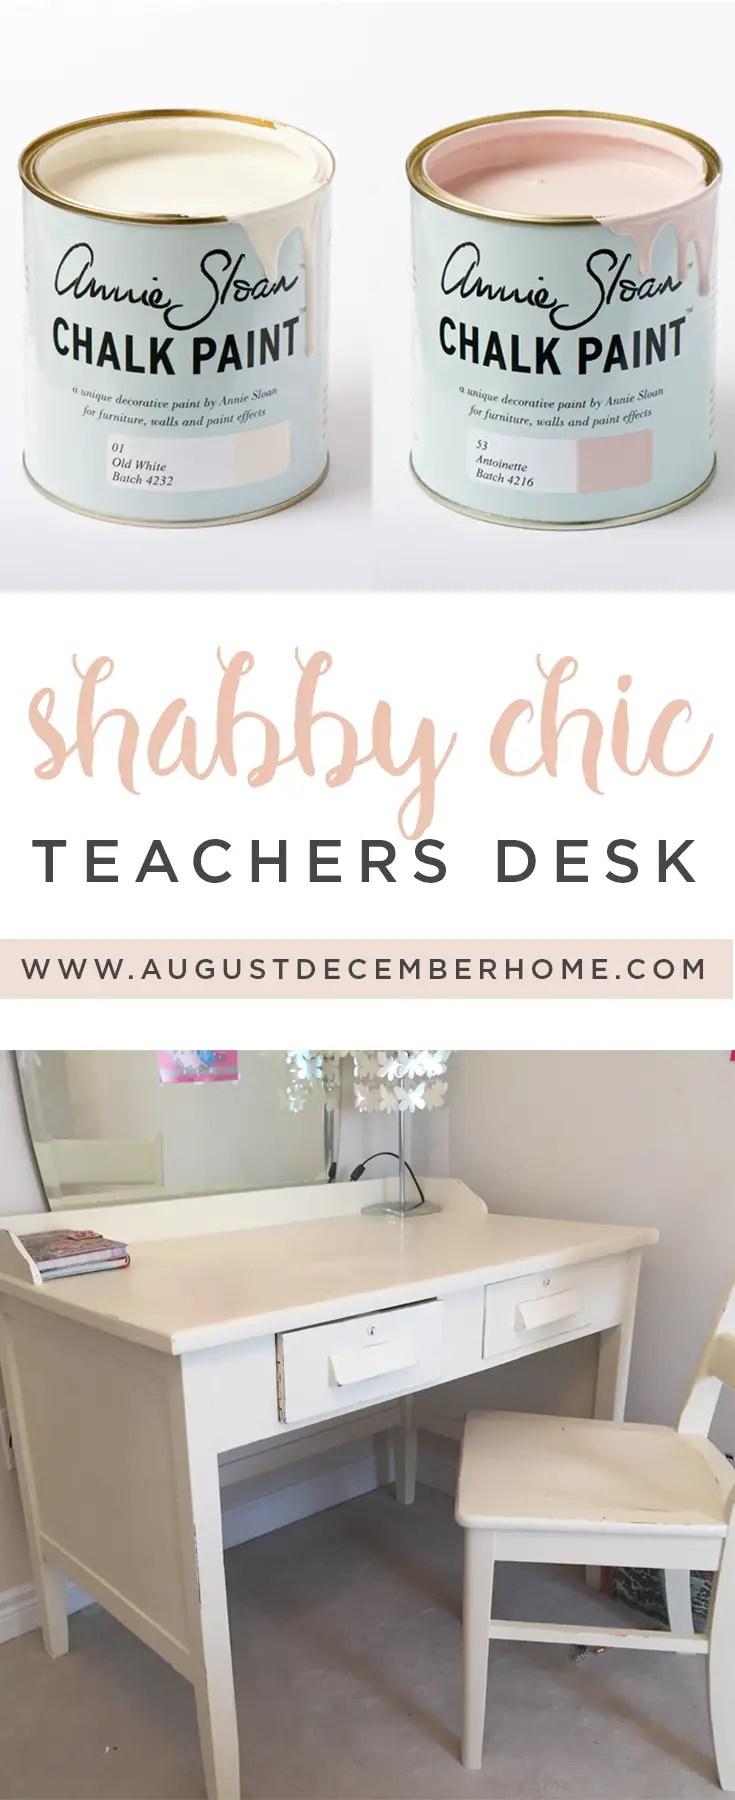 Shabby Chic Teachers Desk Pin